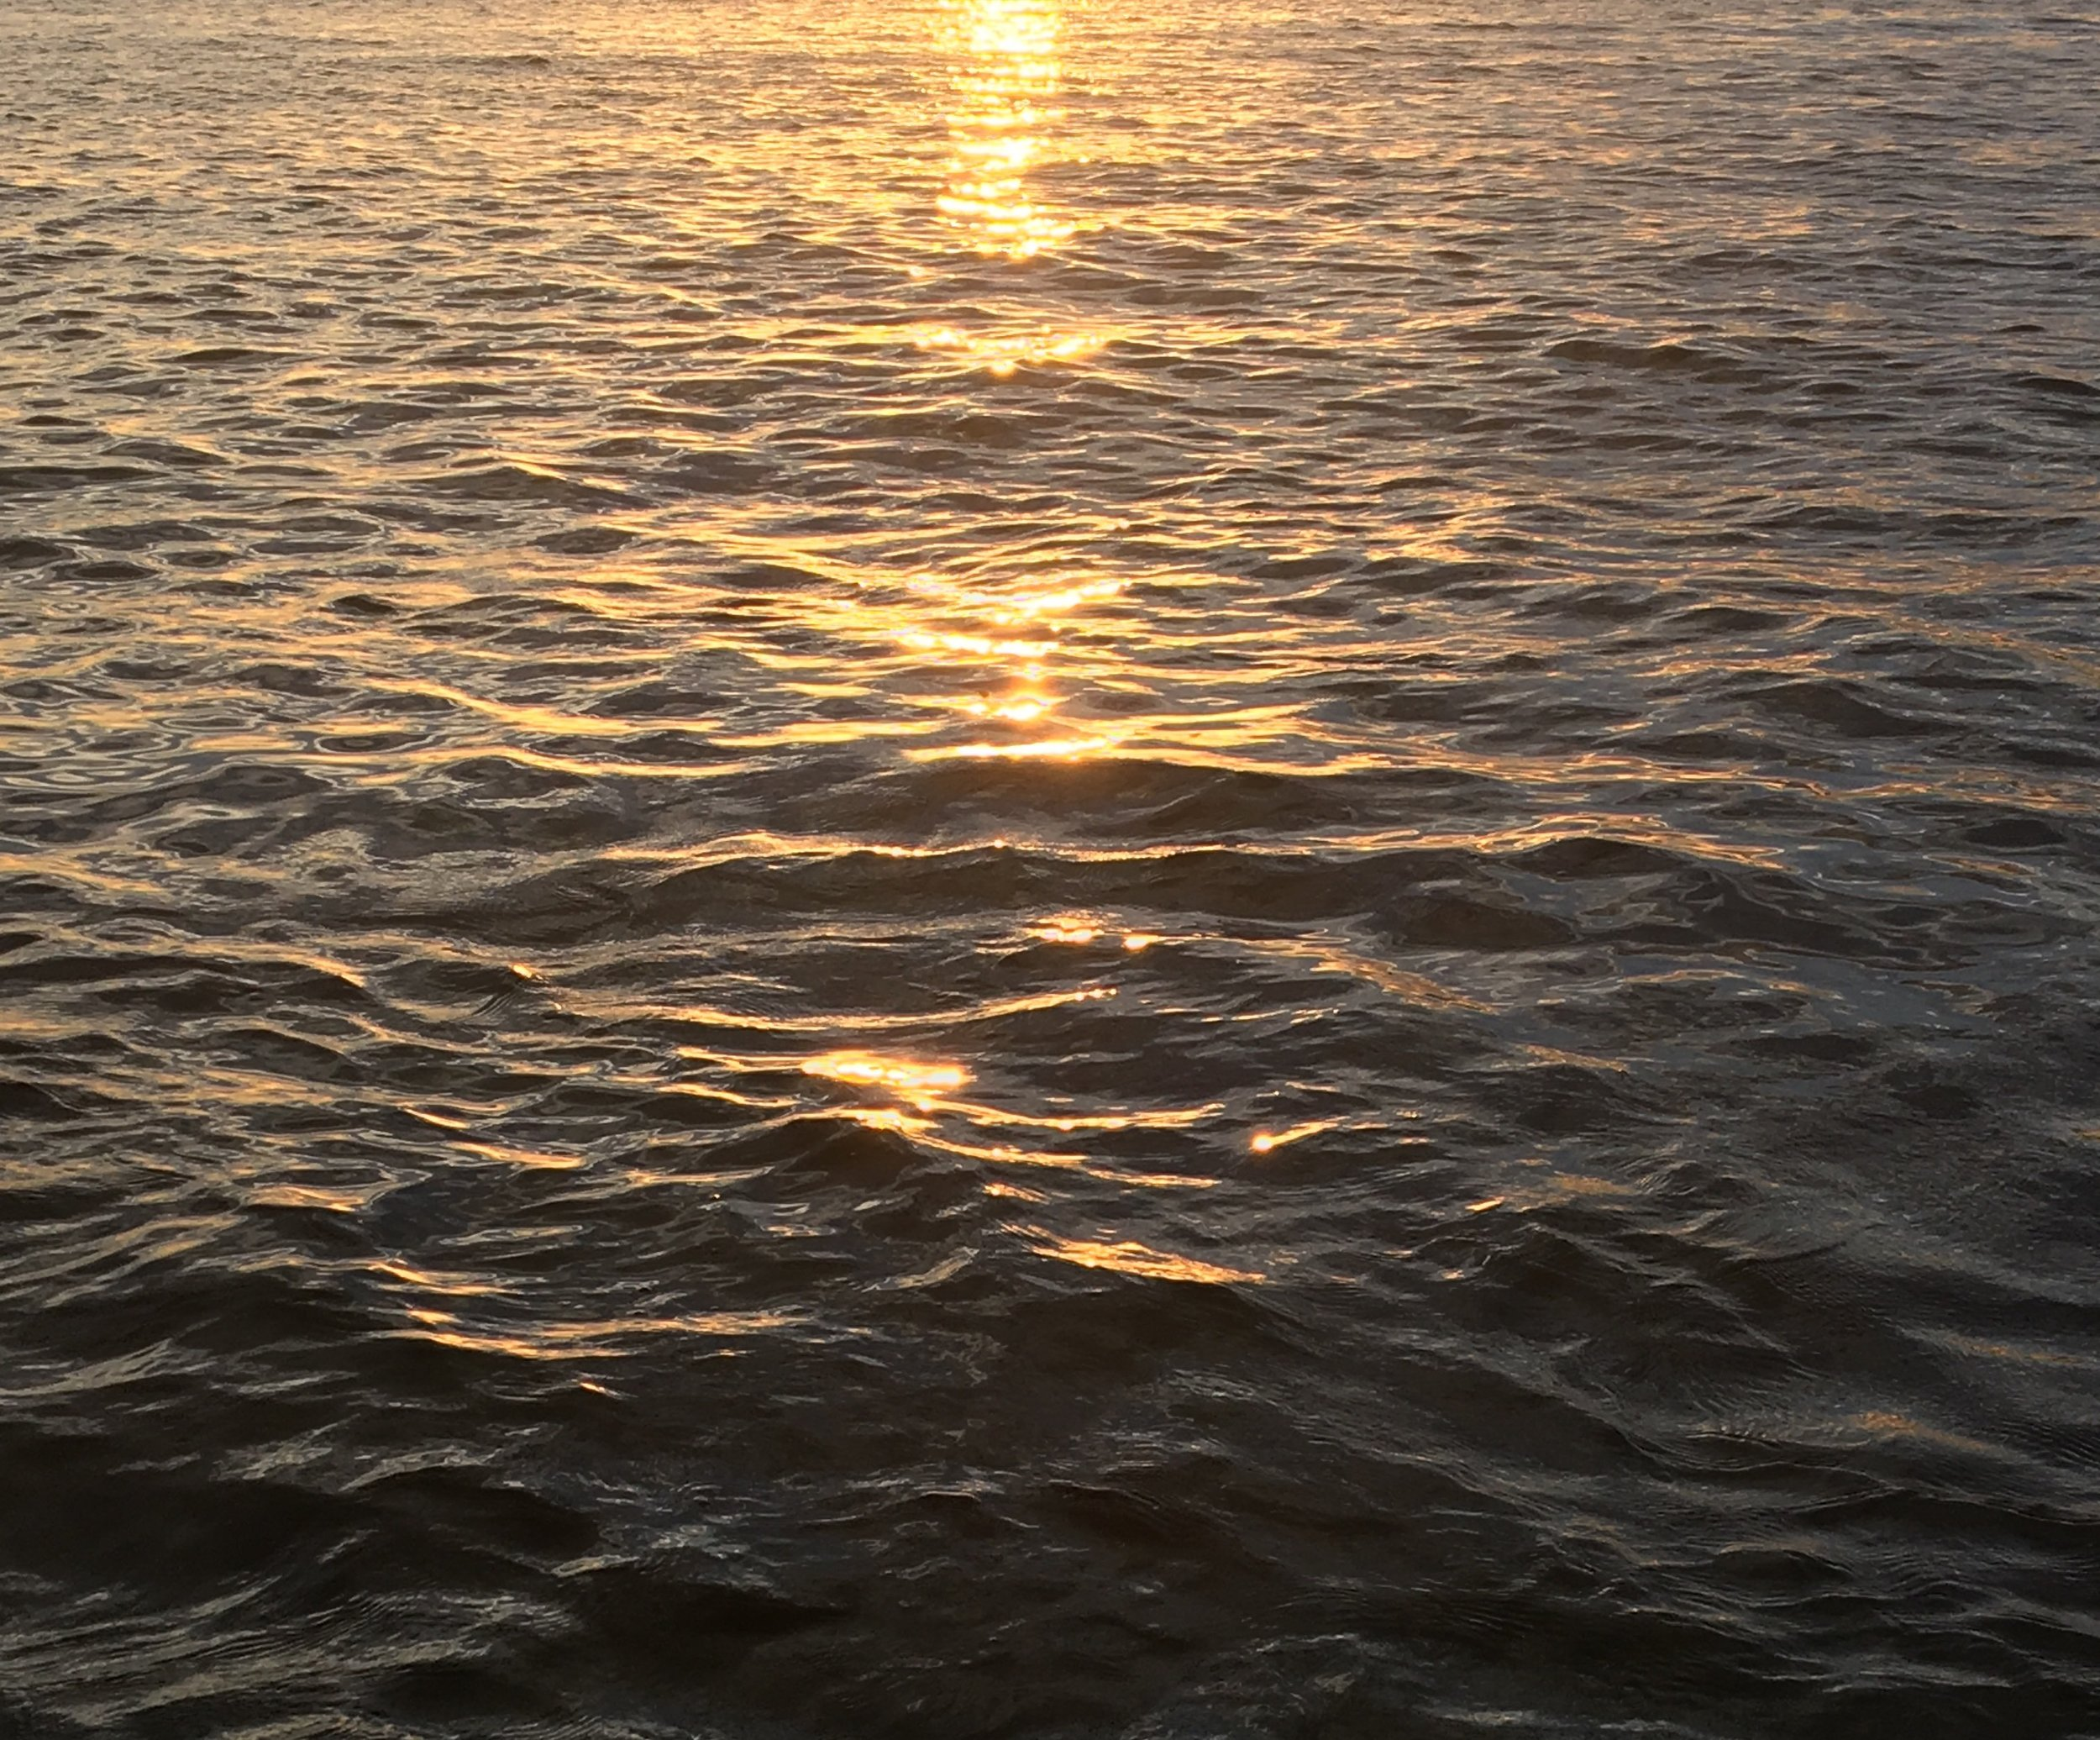 Light on Water.jpg